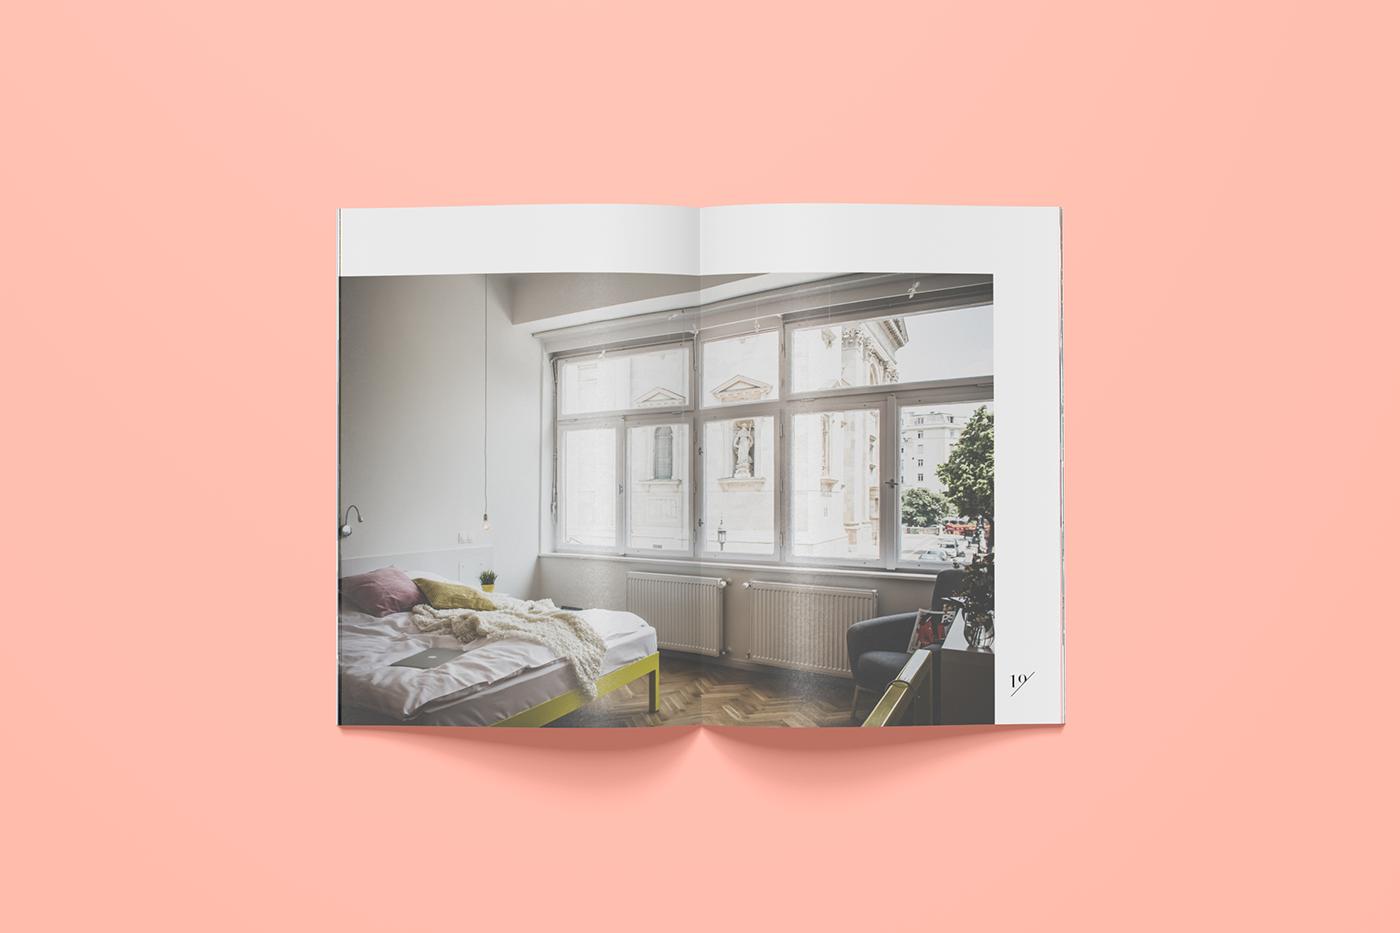 The magazine hotel interior design branding 2015 on for Design hotel 2015